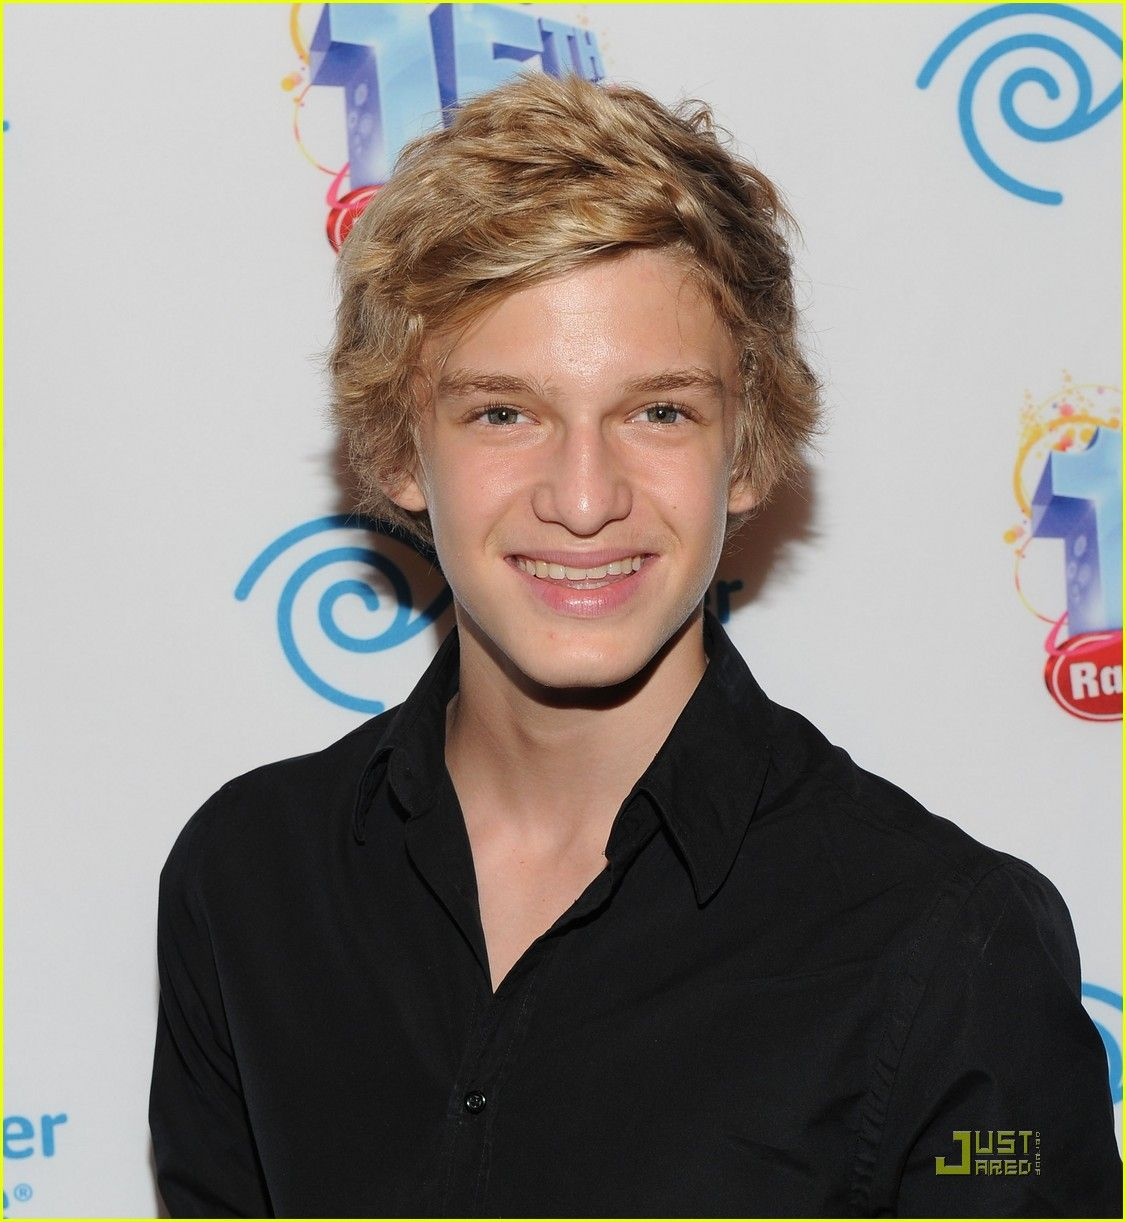 Cody Simpson Cody Simpson Radio Disney Birthday Jam Cody